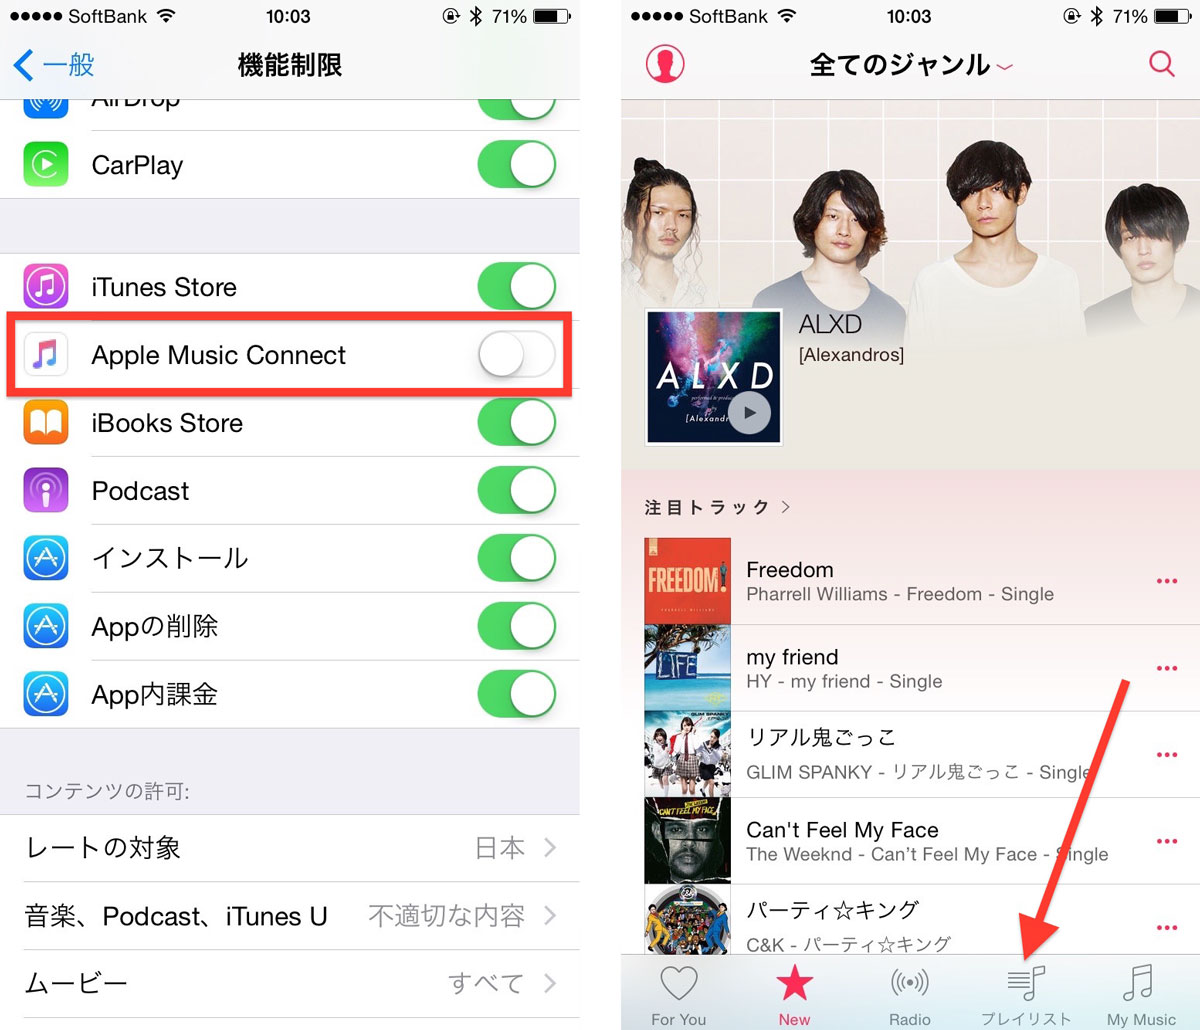 Apple Music Connect オフ